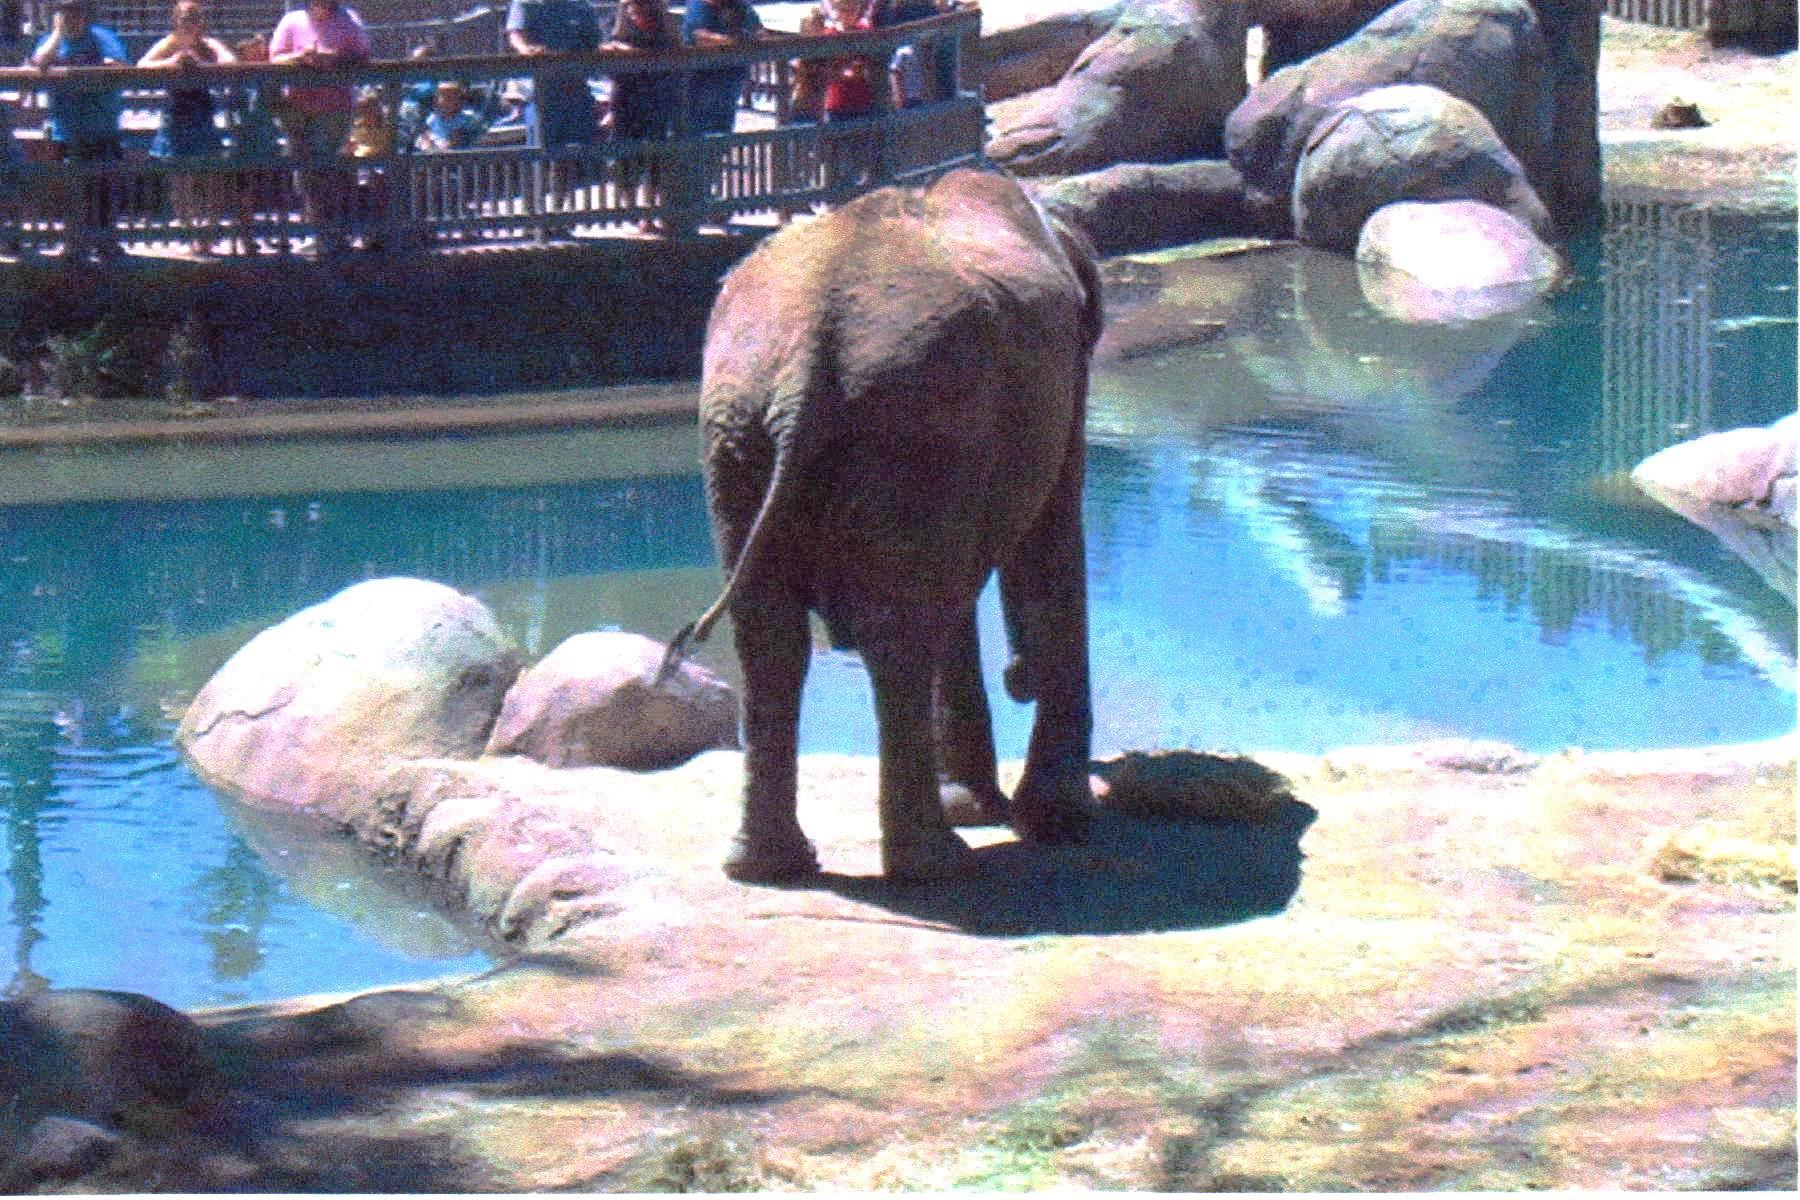 Elephant ass at zoo 2007ish.jpg